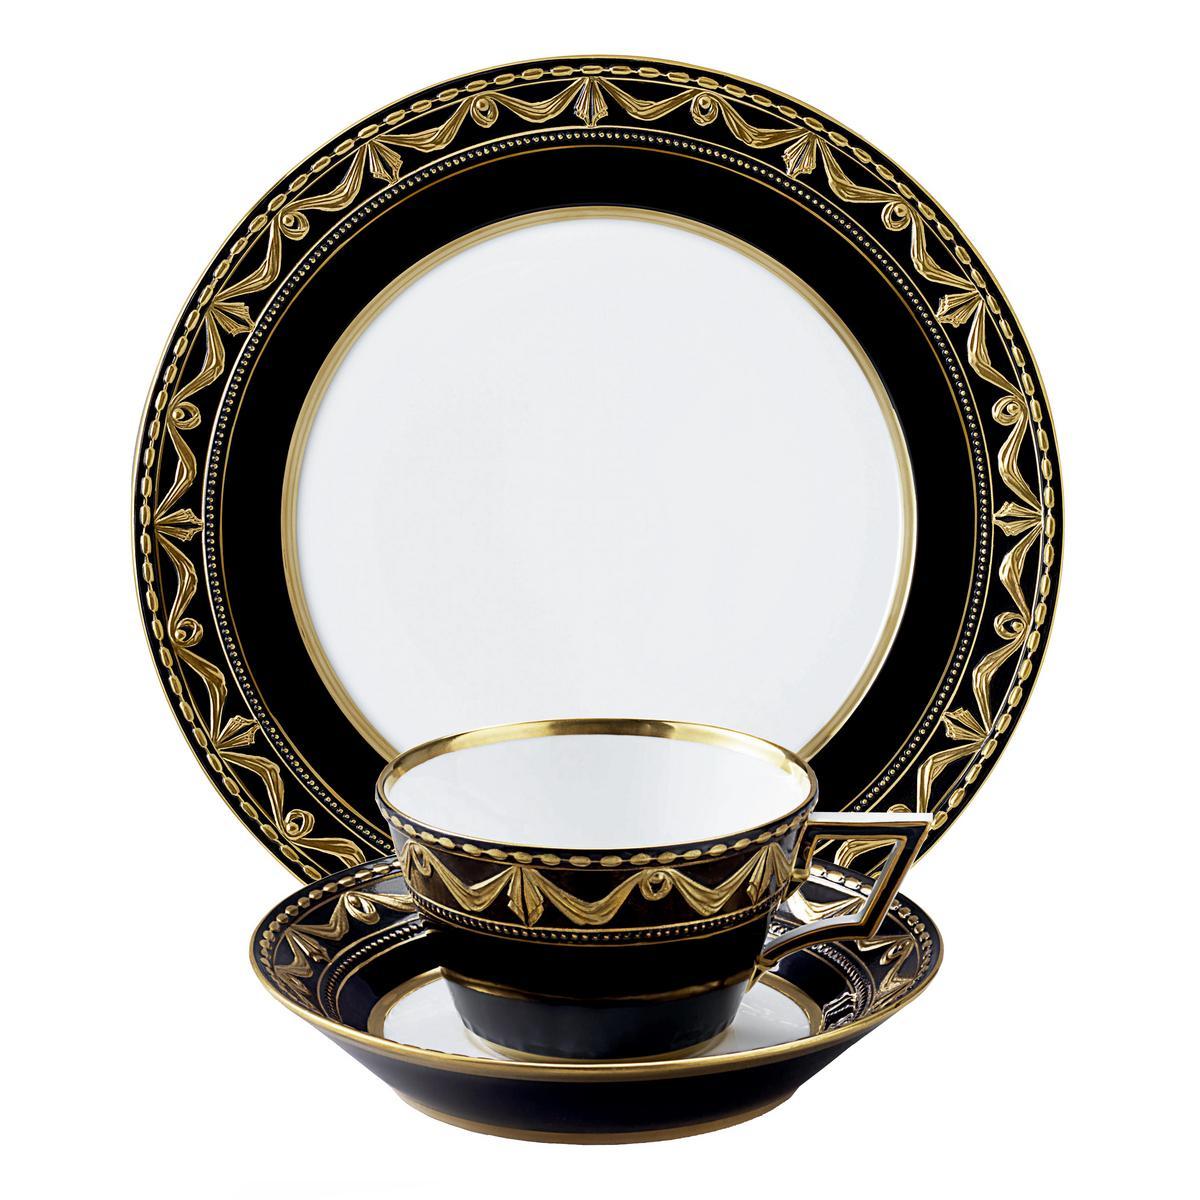 kpm kurland royal noir dinnerware. Black Bedroom Furniture Sets. Home Design Ideas